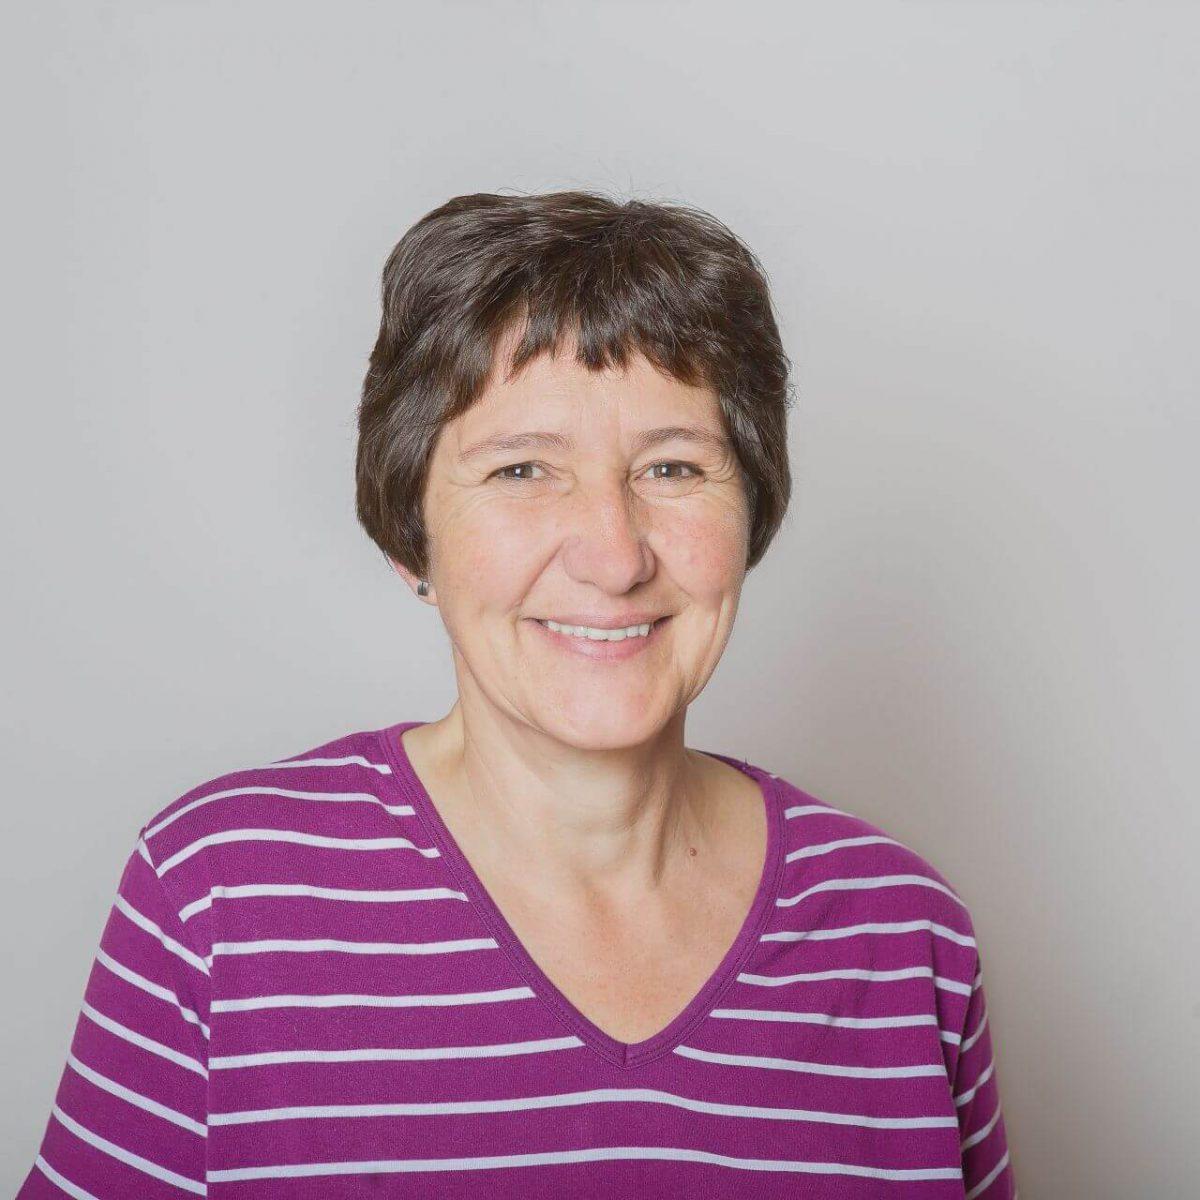 Monika Schnider